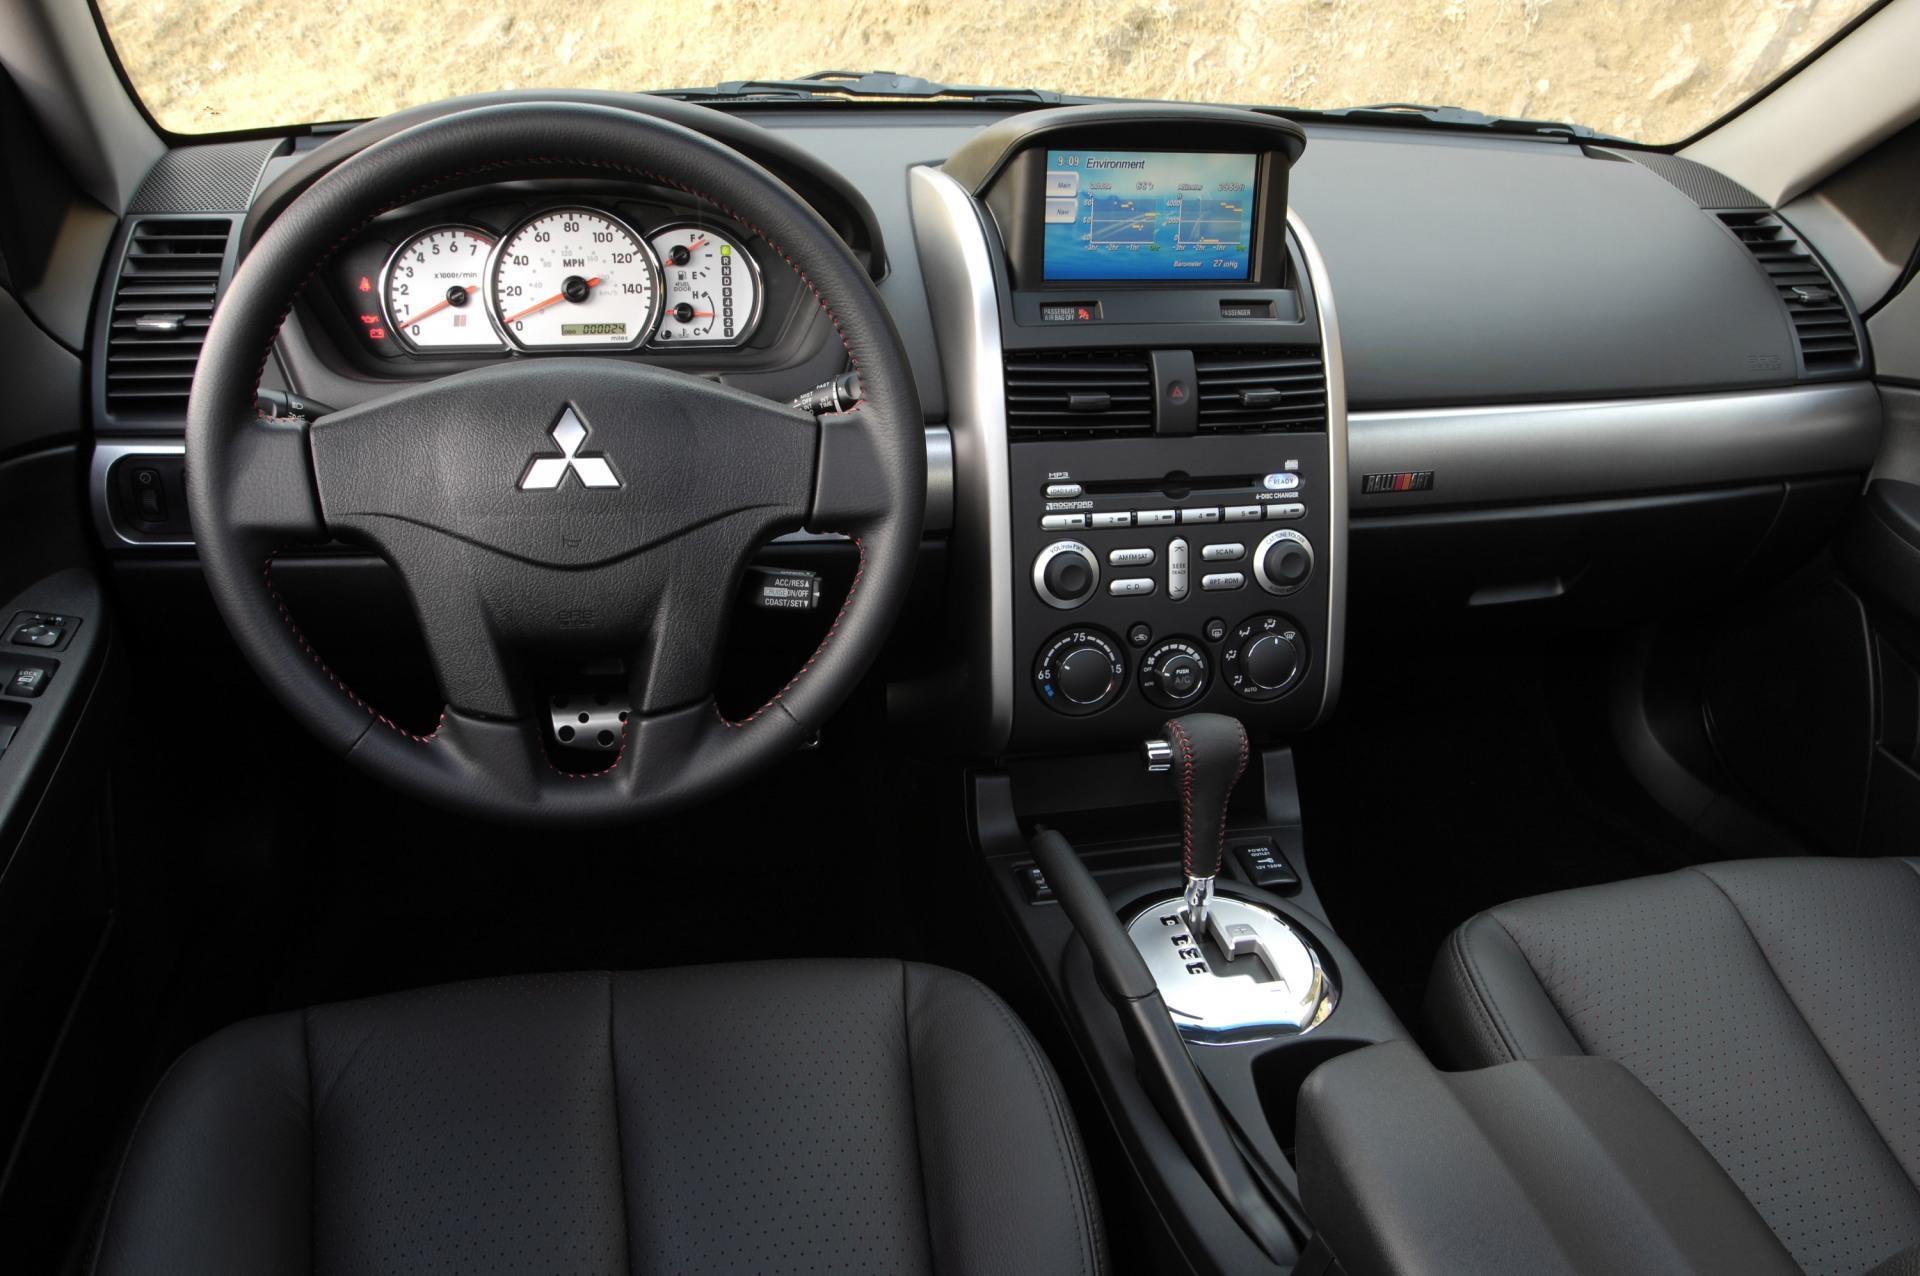 2009 Mitsubishi Galant Image. Photo 3 of 25